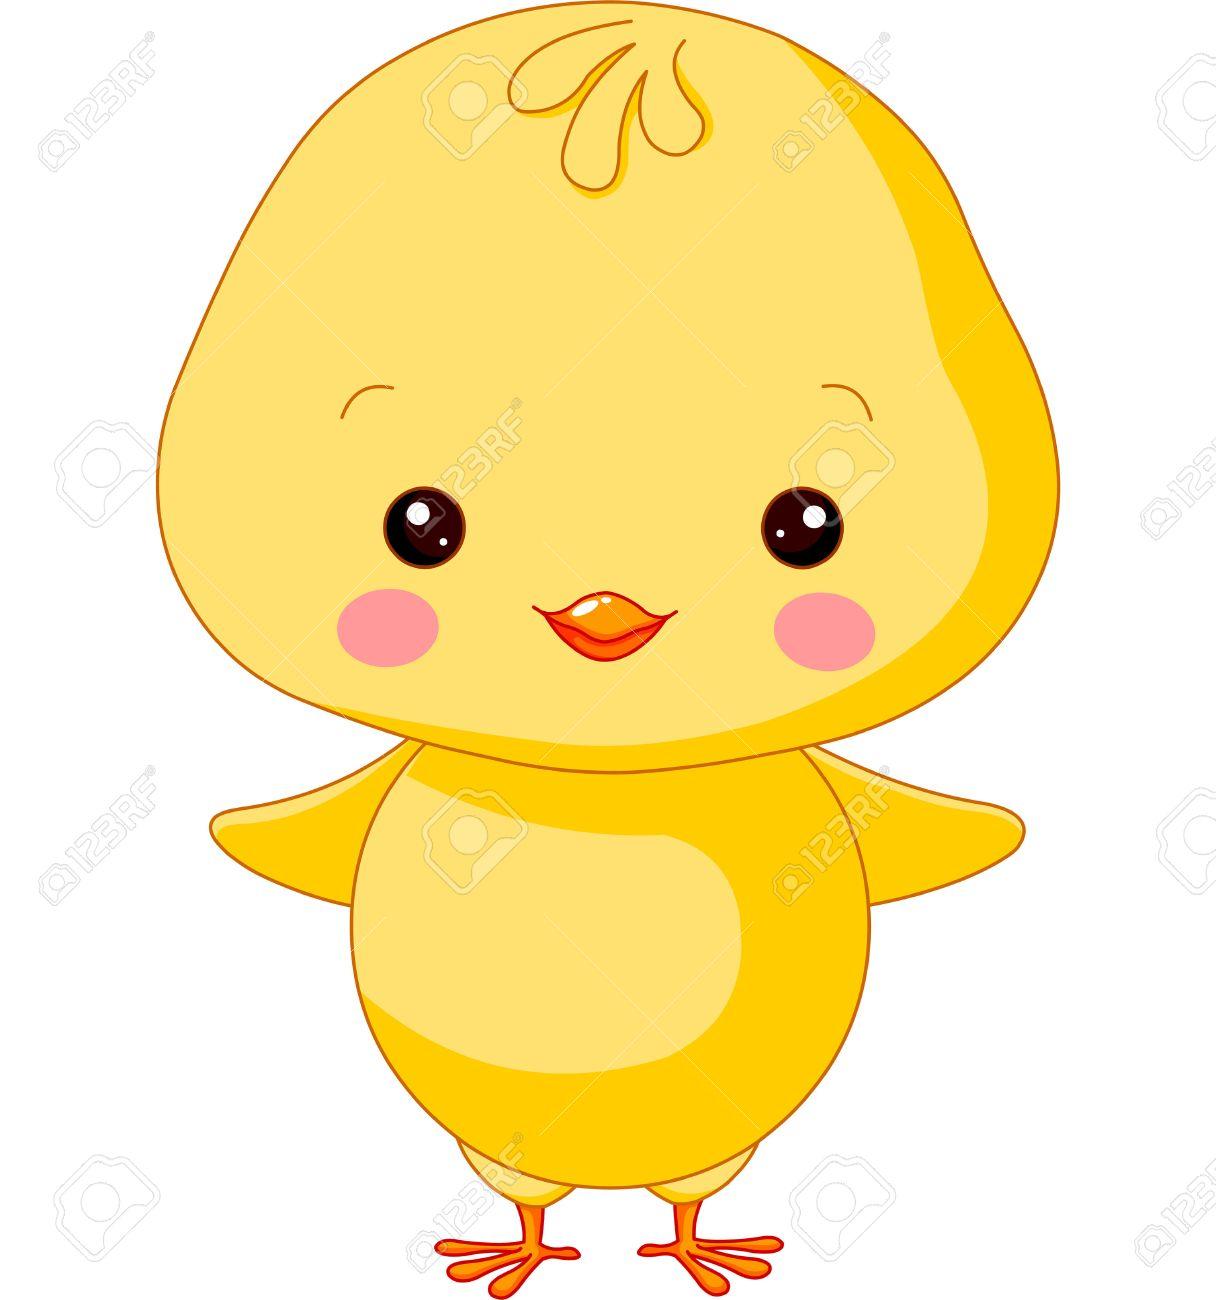 Farm animals. Illustration of cute Chick.